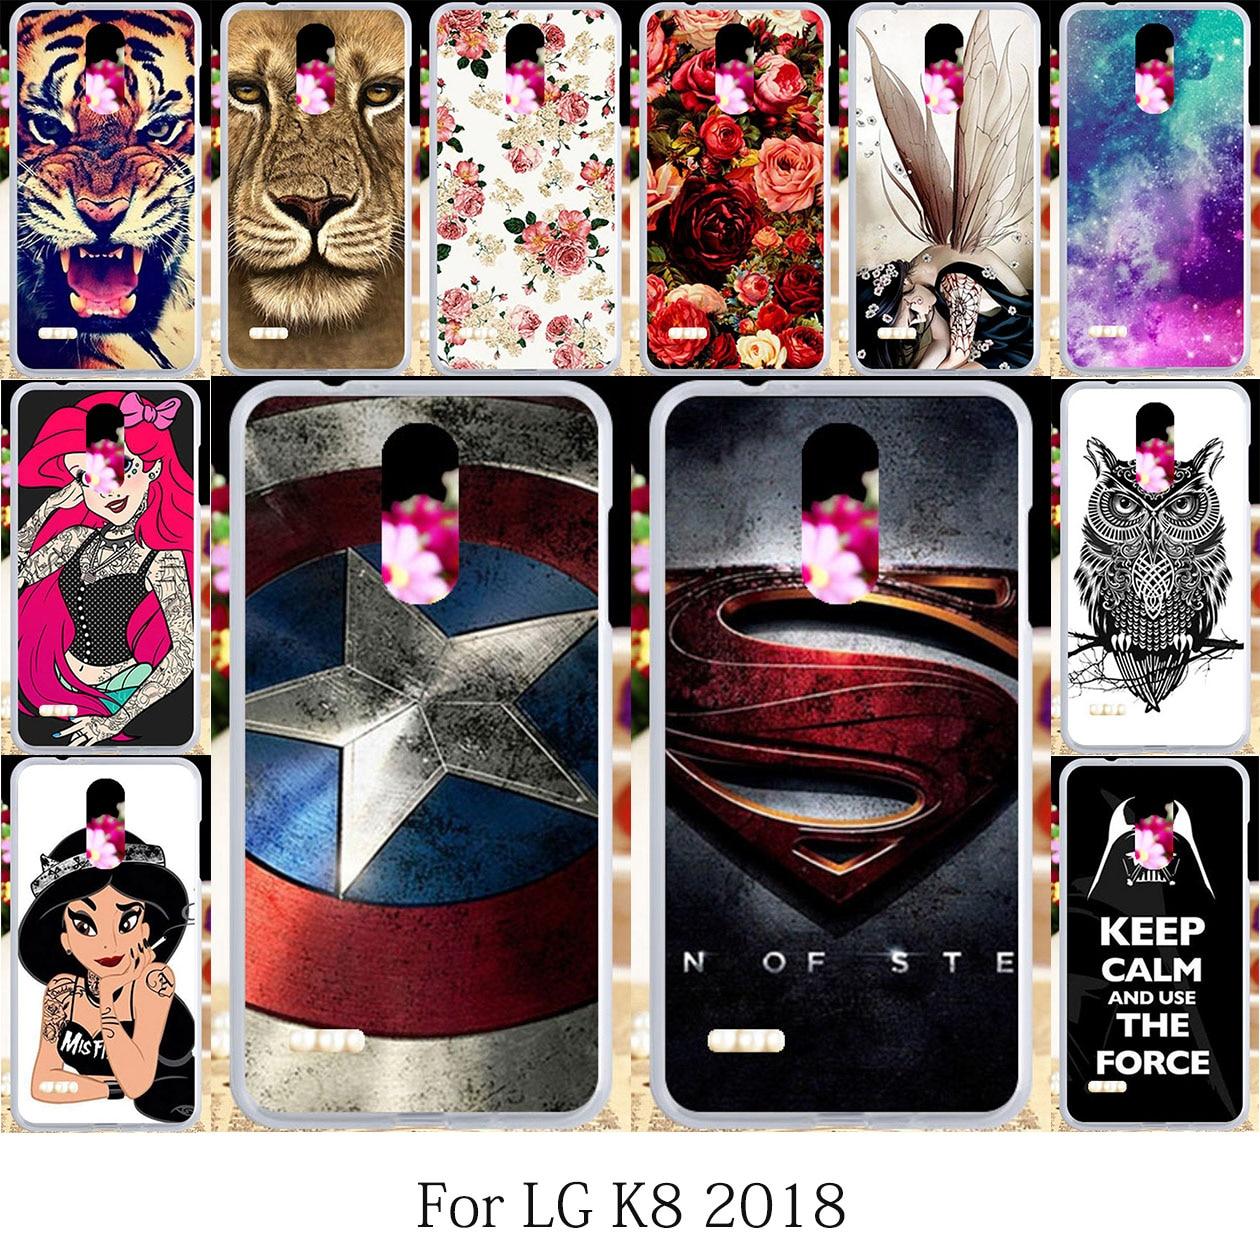 TAOYUNXI Phone Case For LG K8 2018 LG K9 For LG Aristo 2